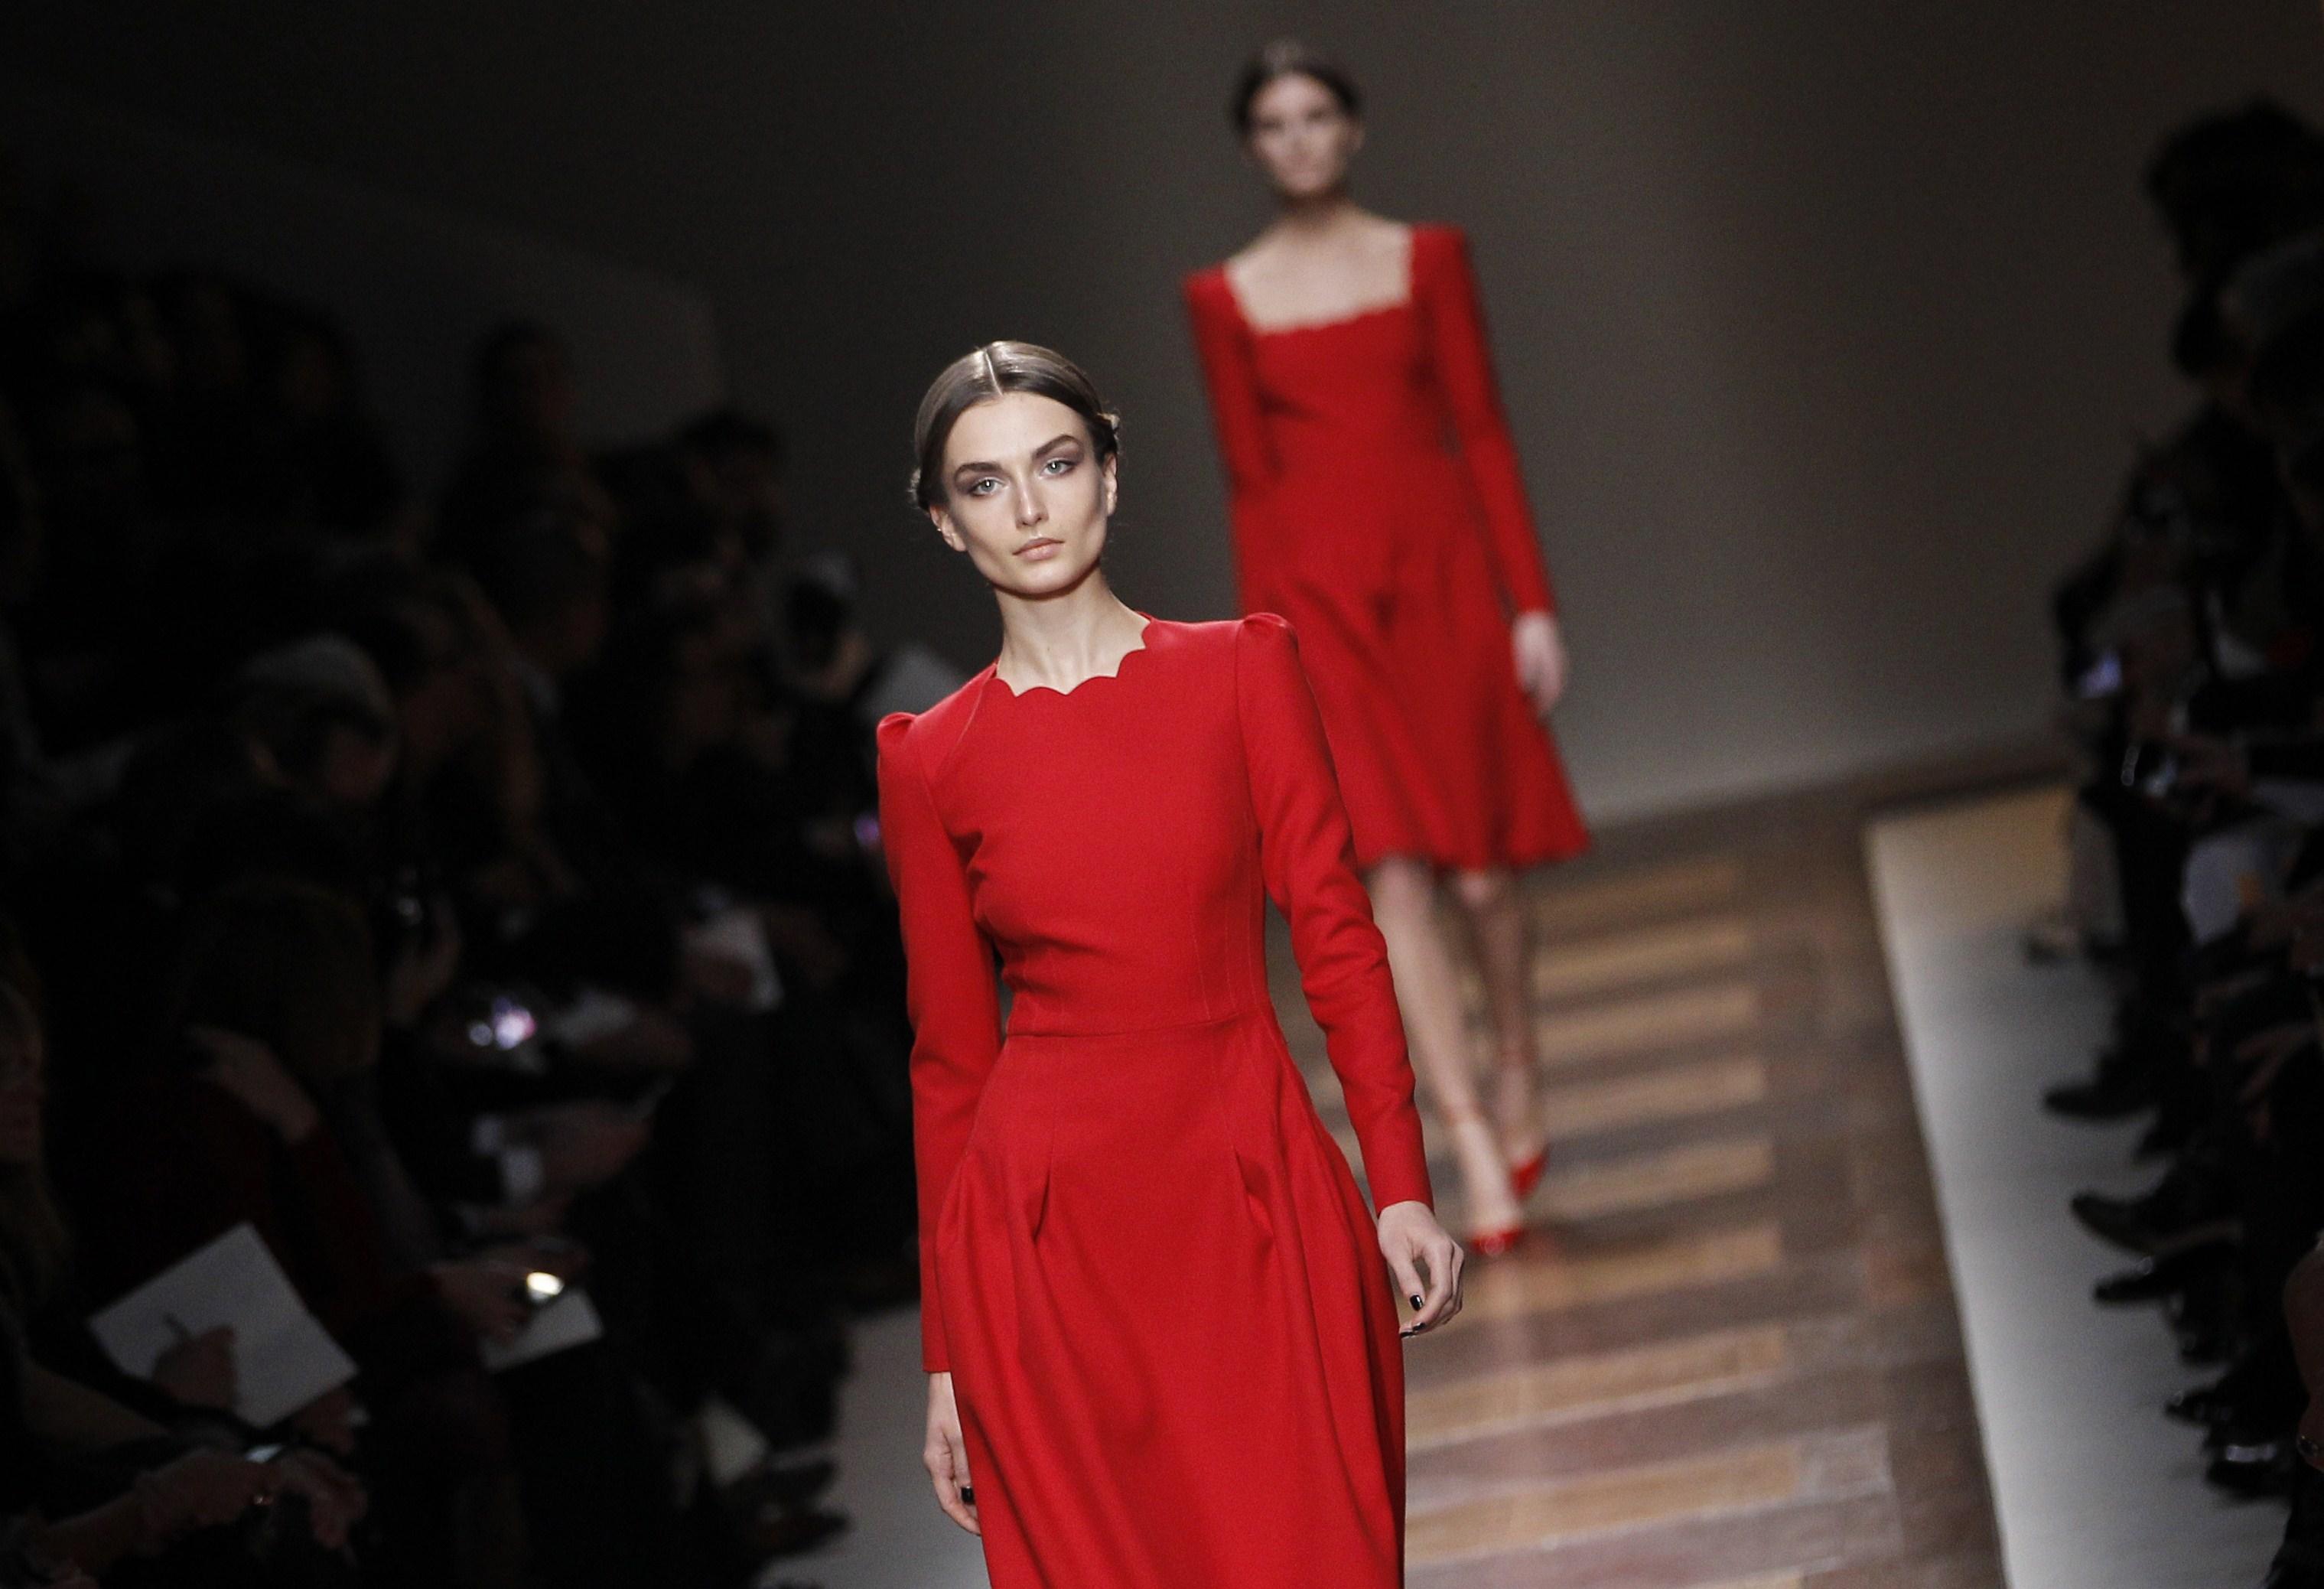 db9388189aab4 Il rosso Valentino sfila a Parigi